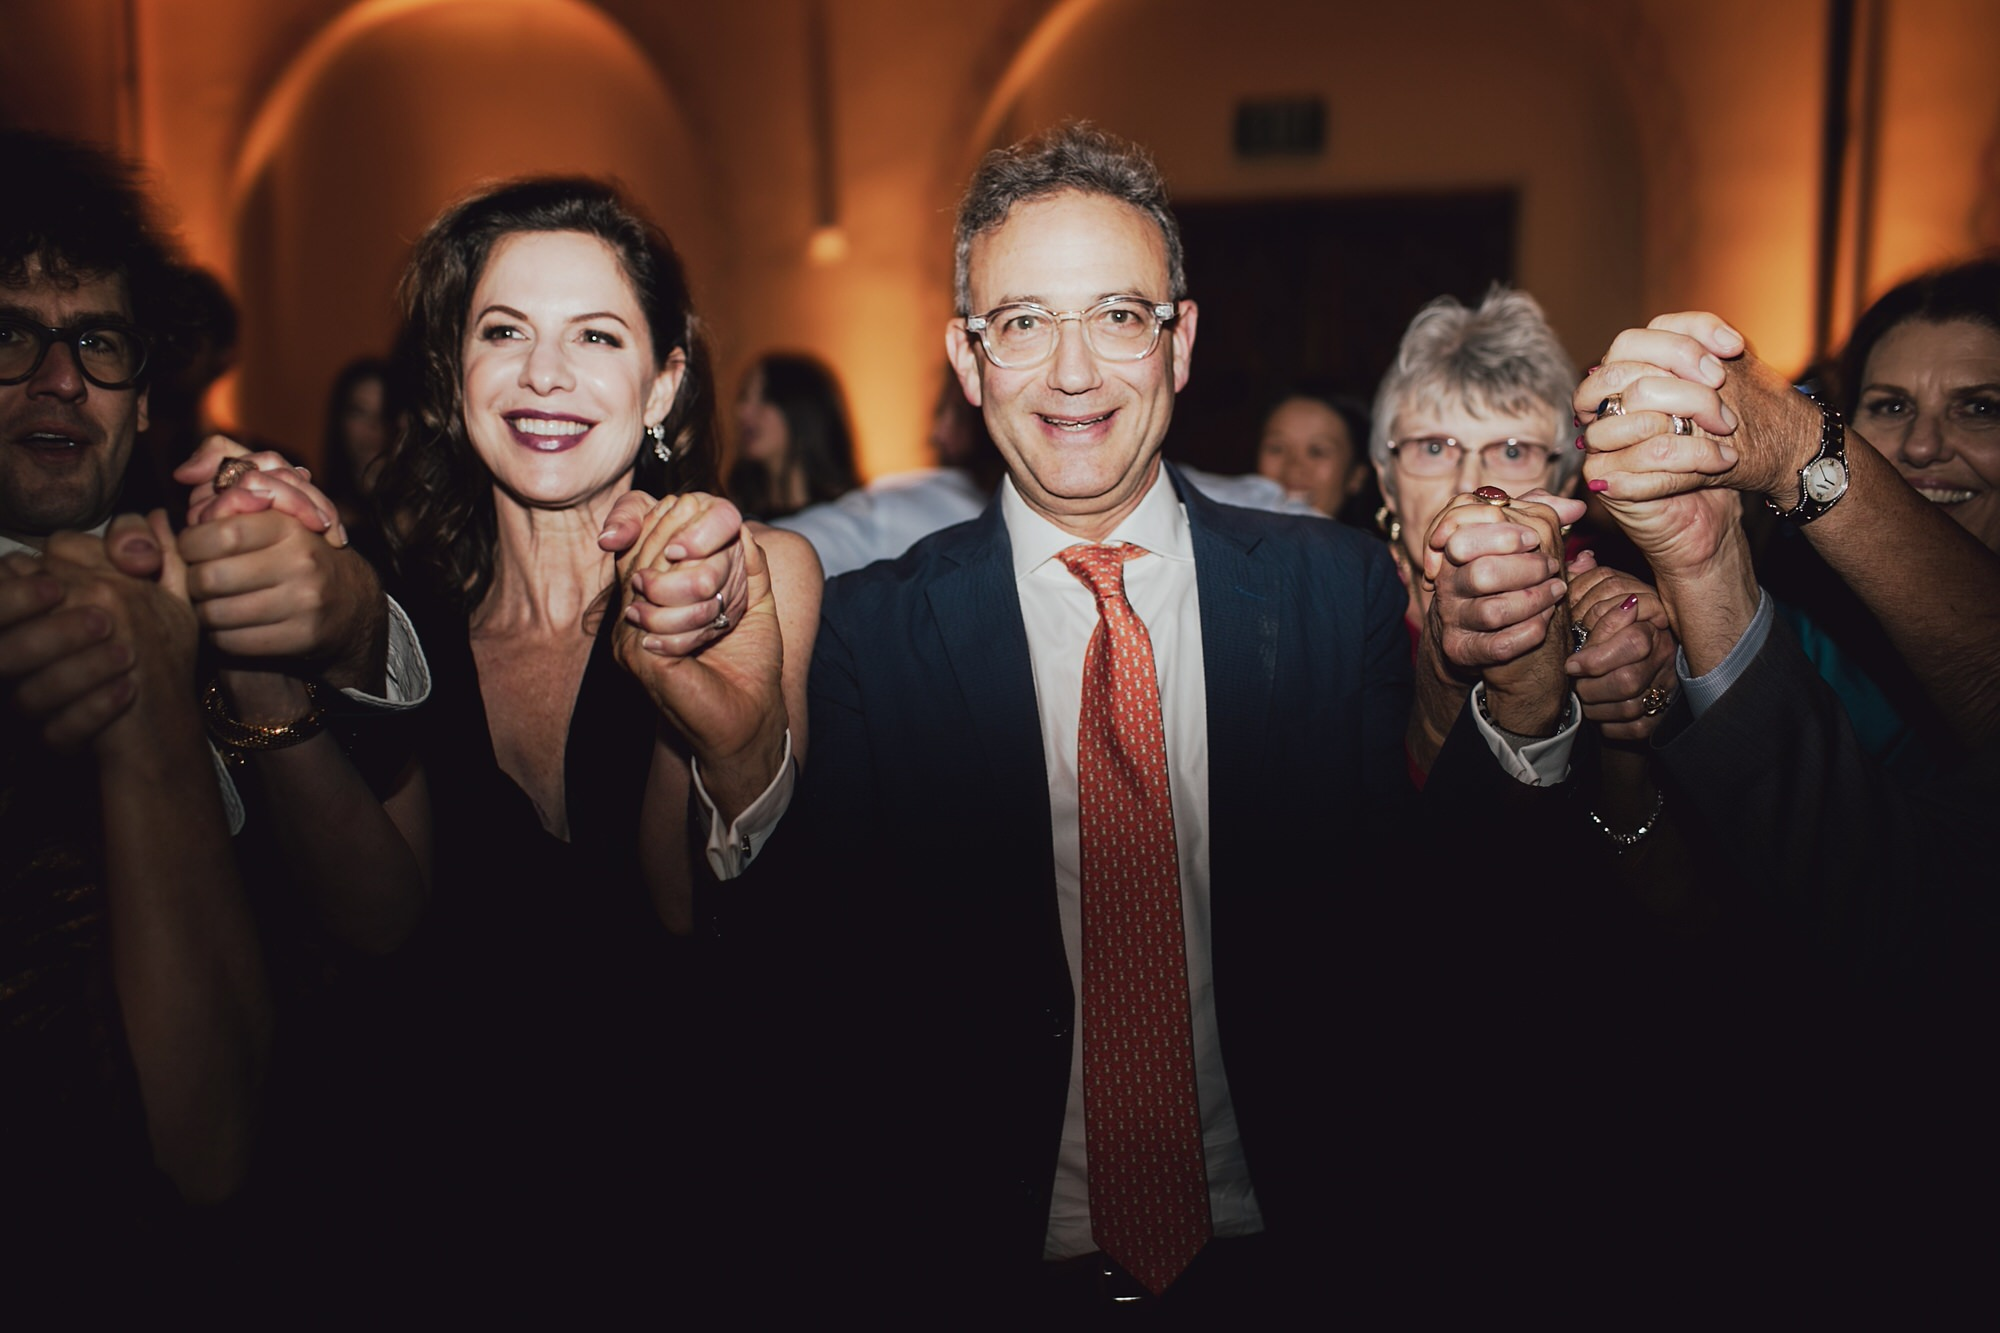 natalie-andy-ojai-valley-inn-wedding-photographer-89.JPG